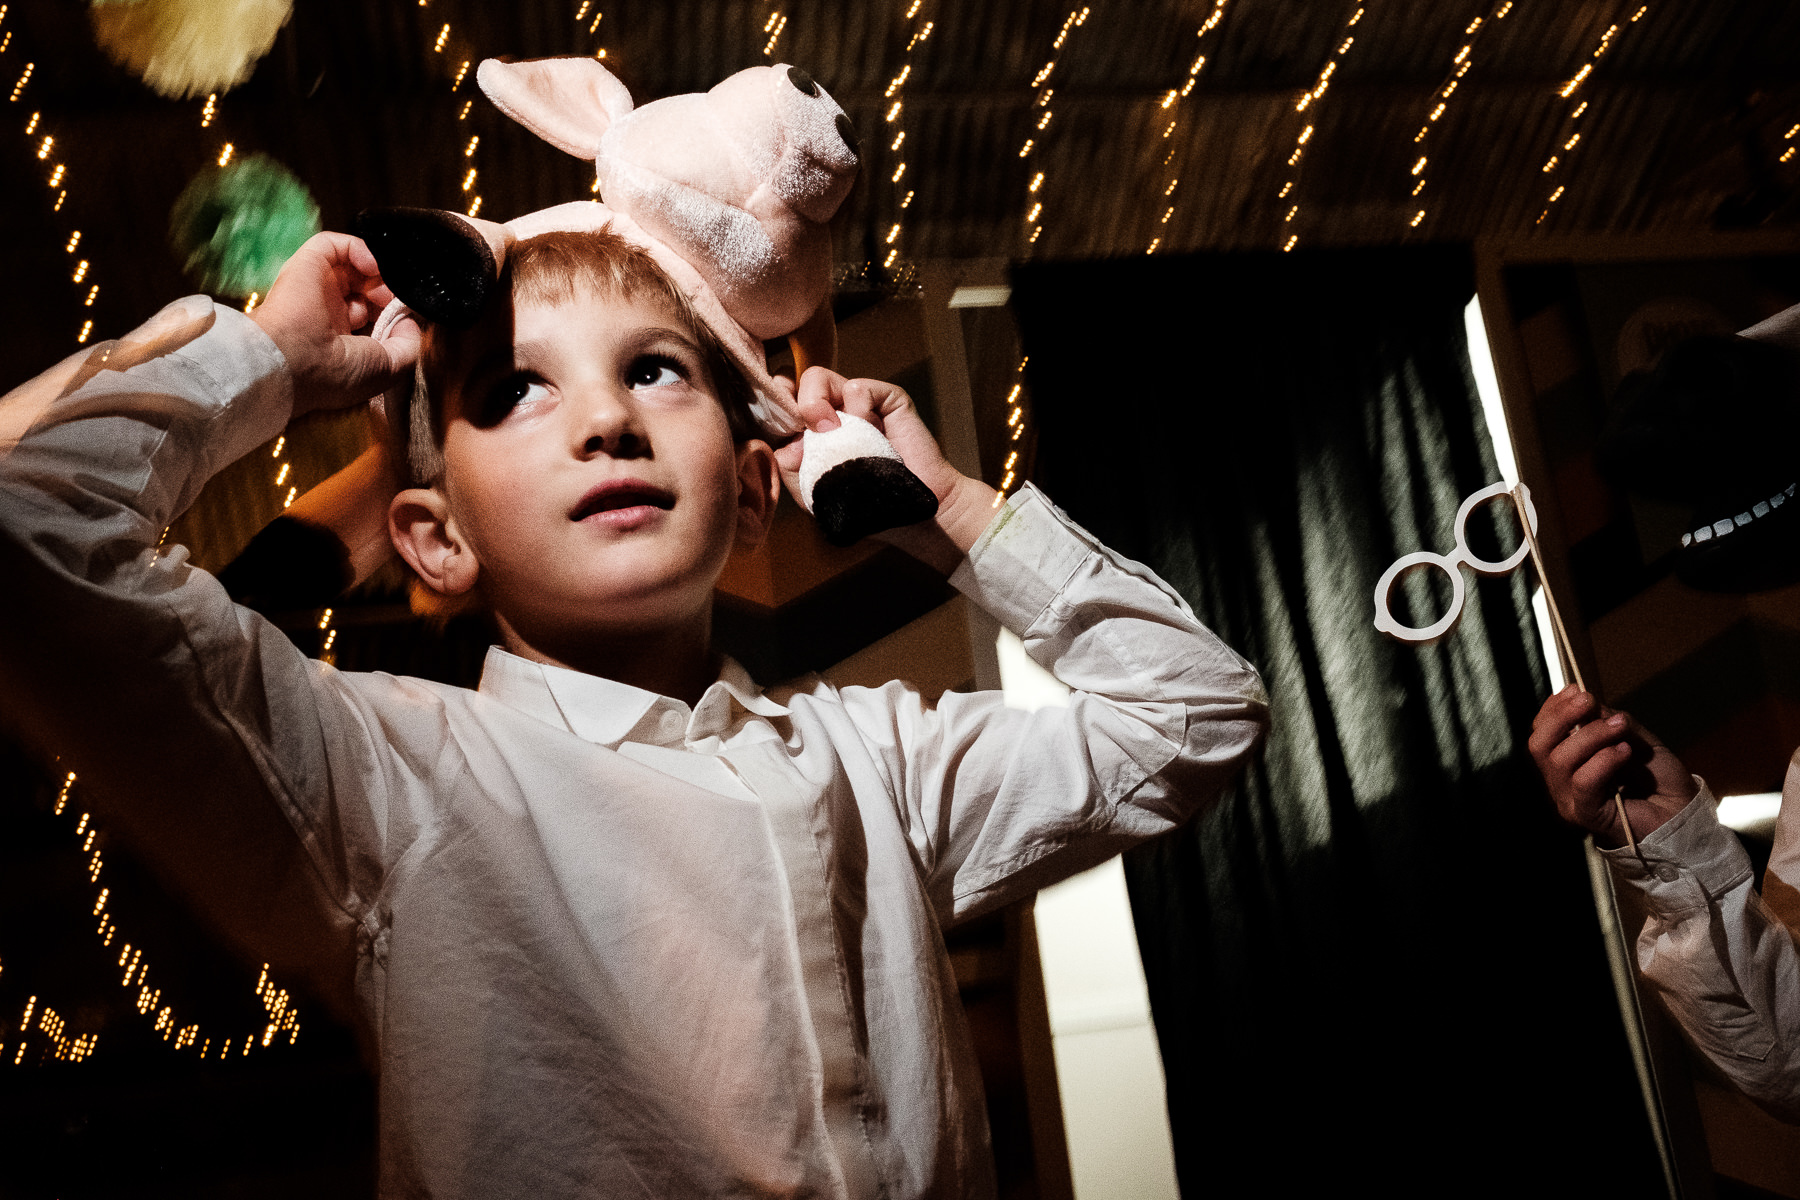 boy wearing mask at wedding reception